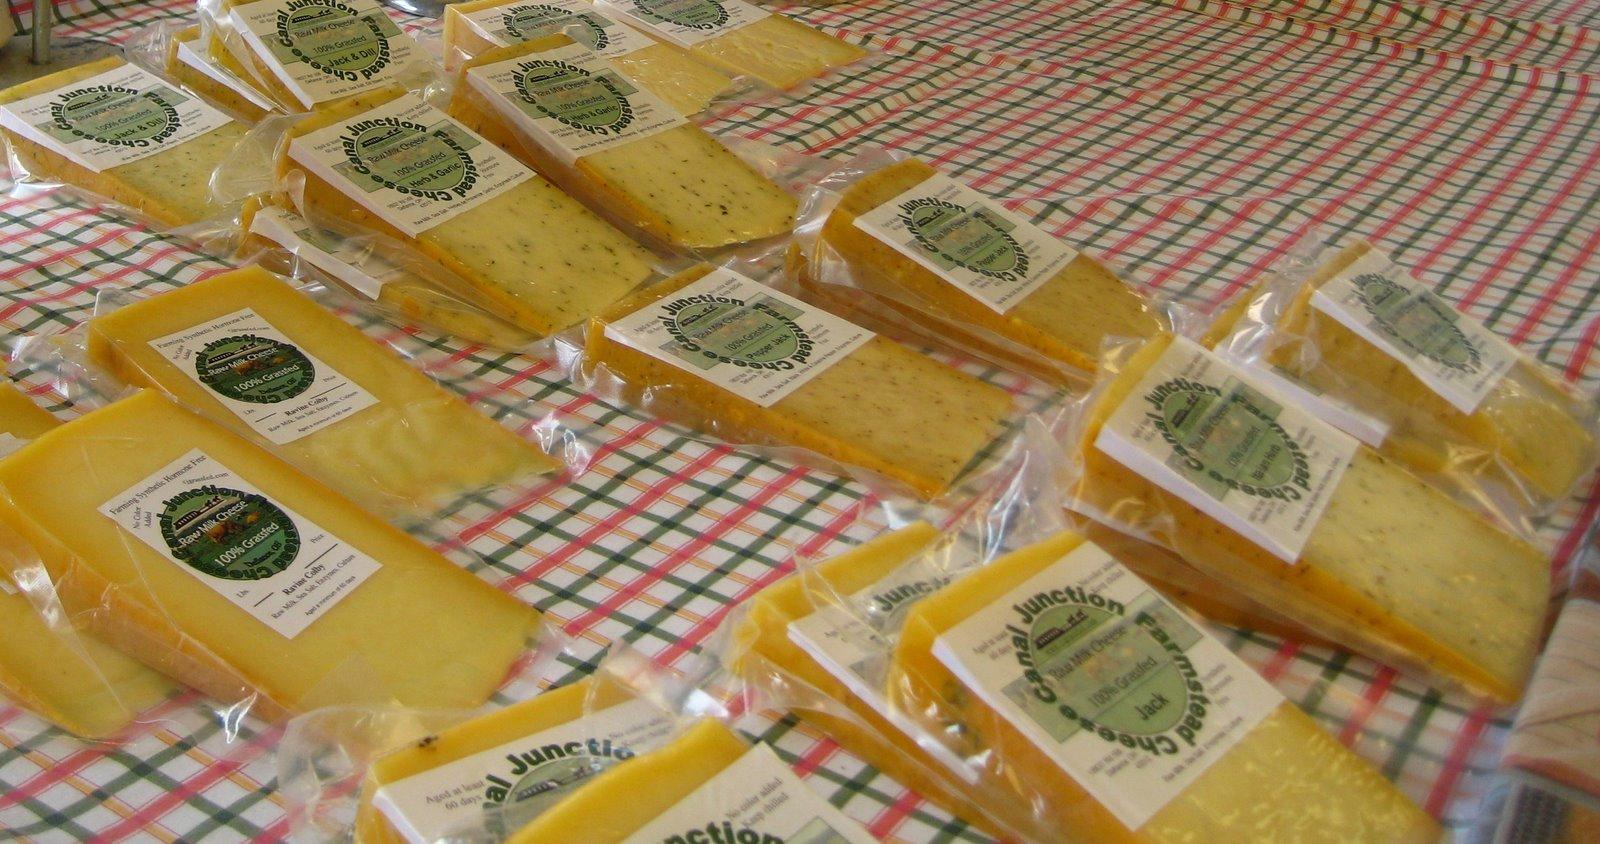 [cheeses.jpg]